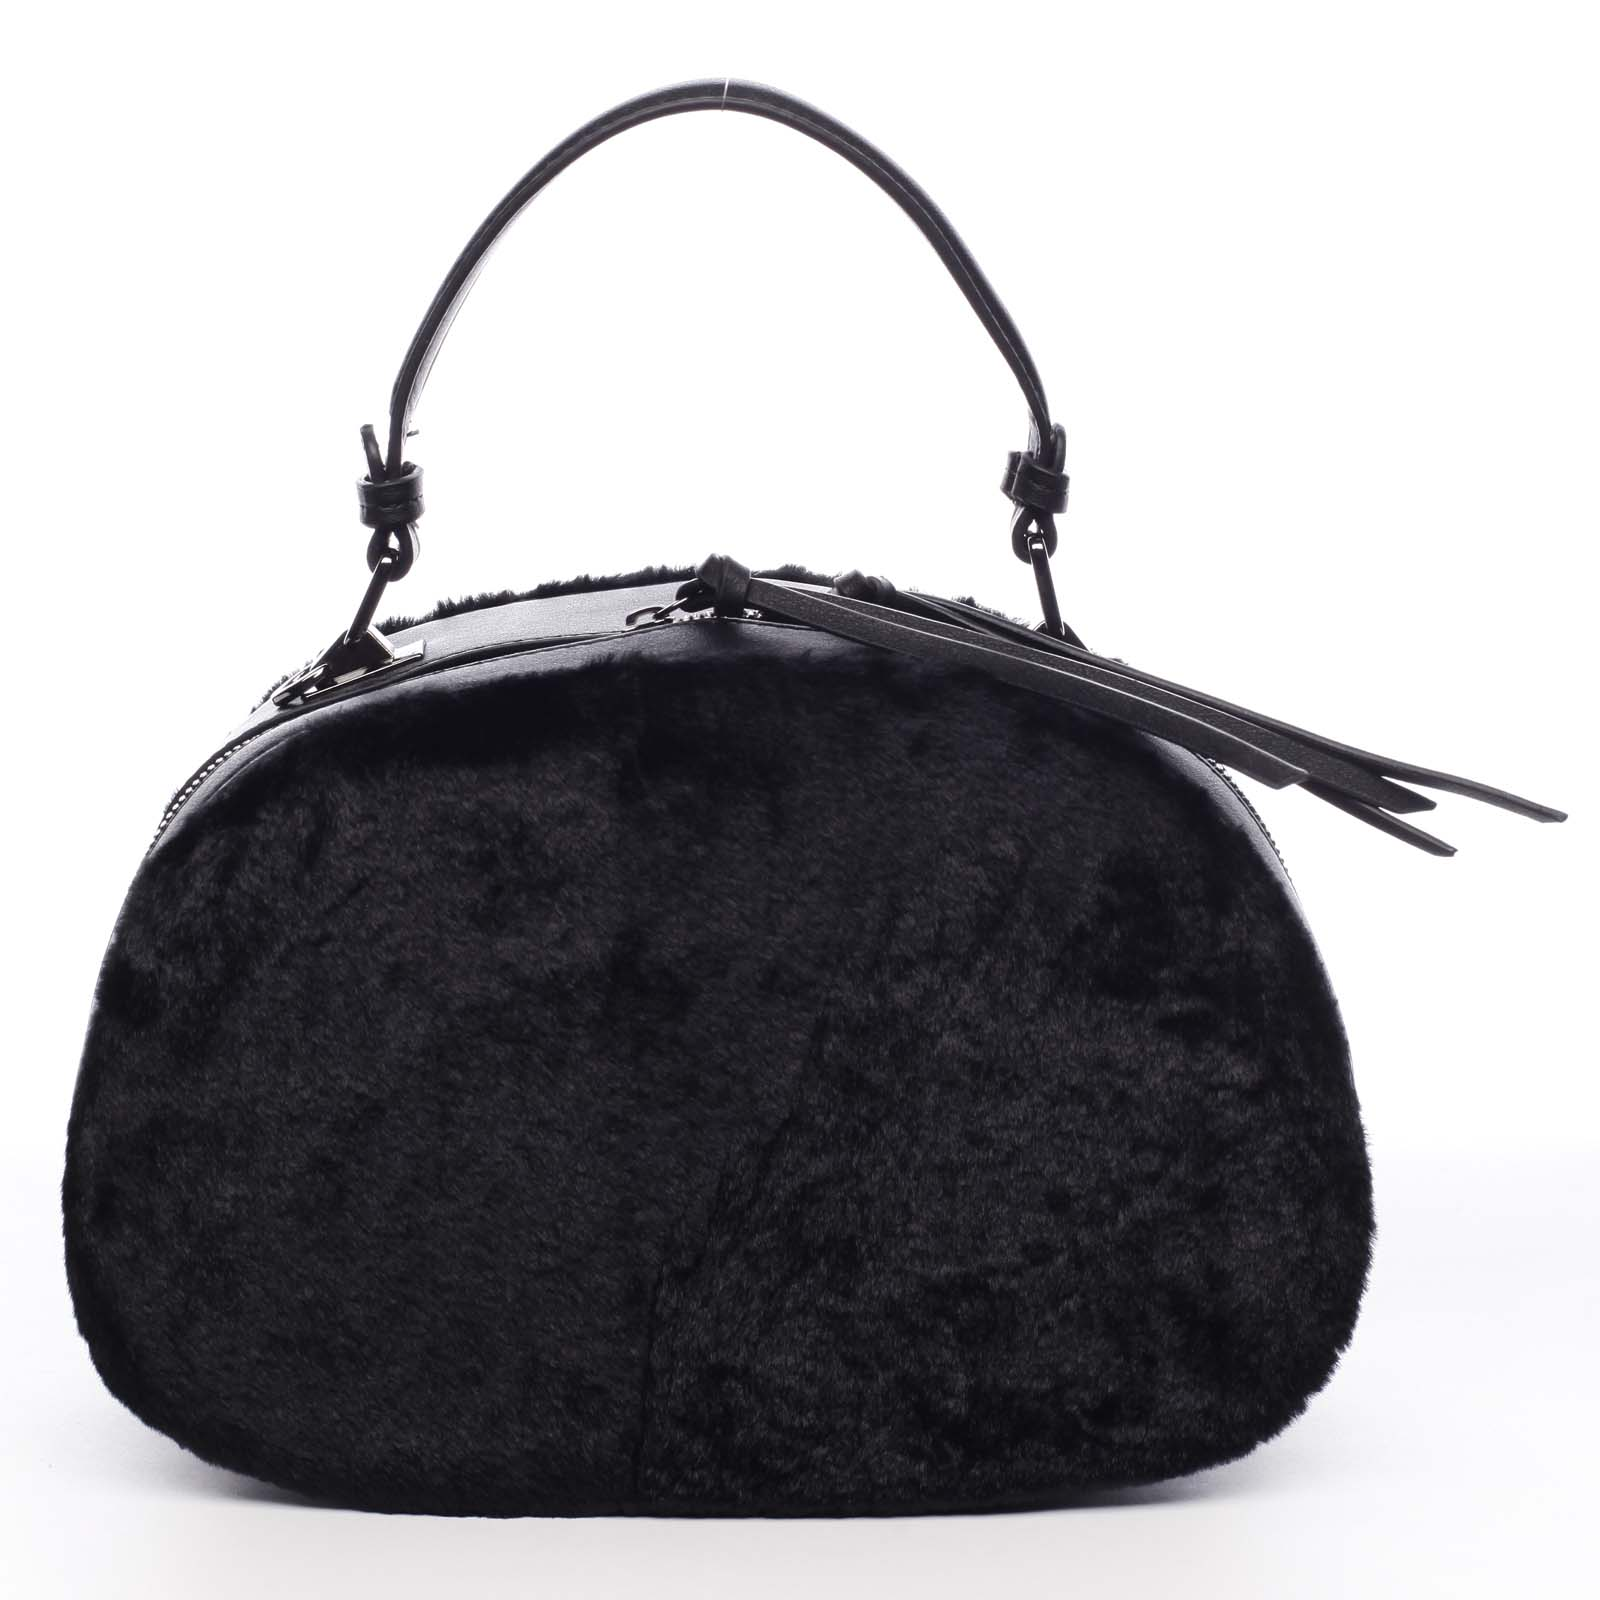 Dámska kožušinová kabelka čierna - MARIA C Hasiel